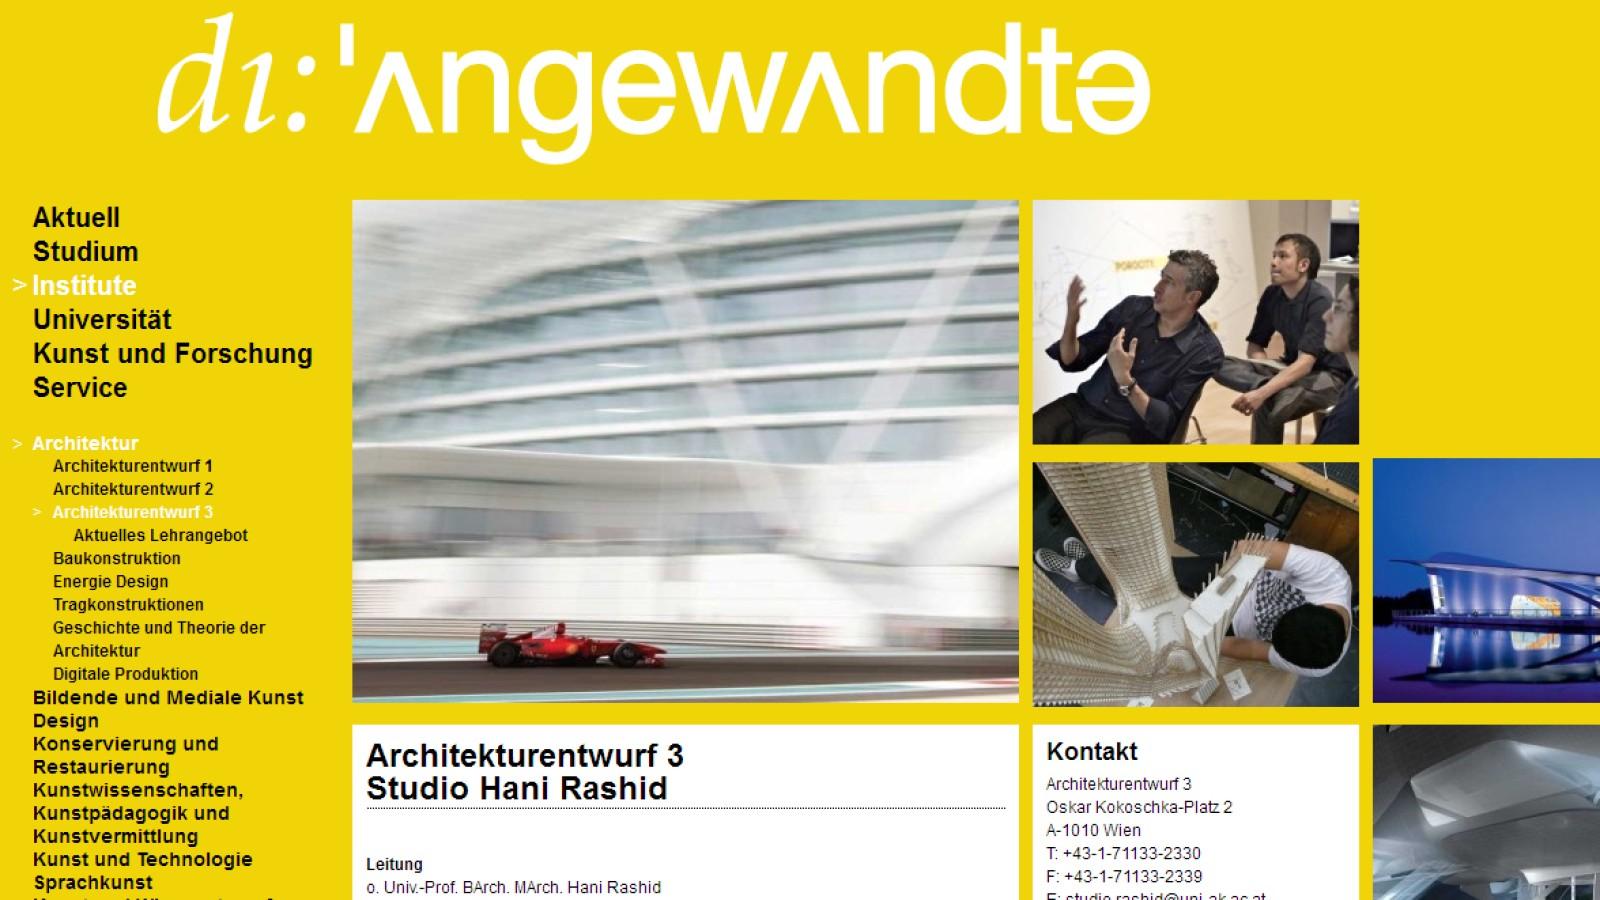 University Of Applied Arts Vienna Project Widrichfilm